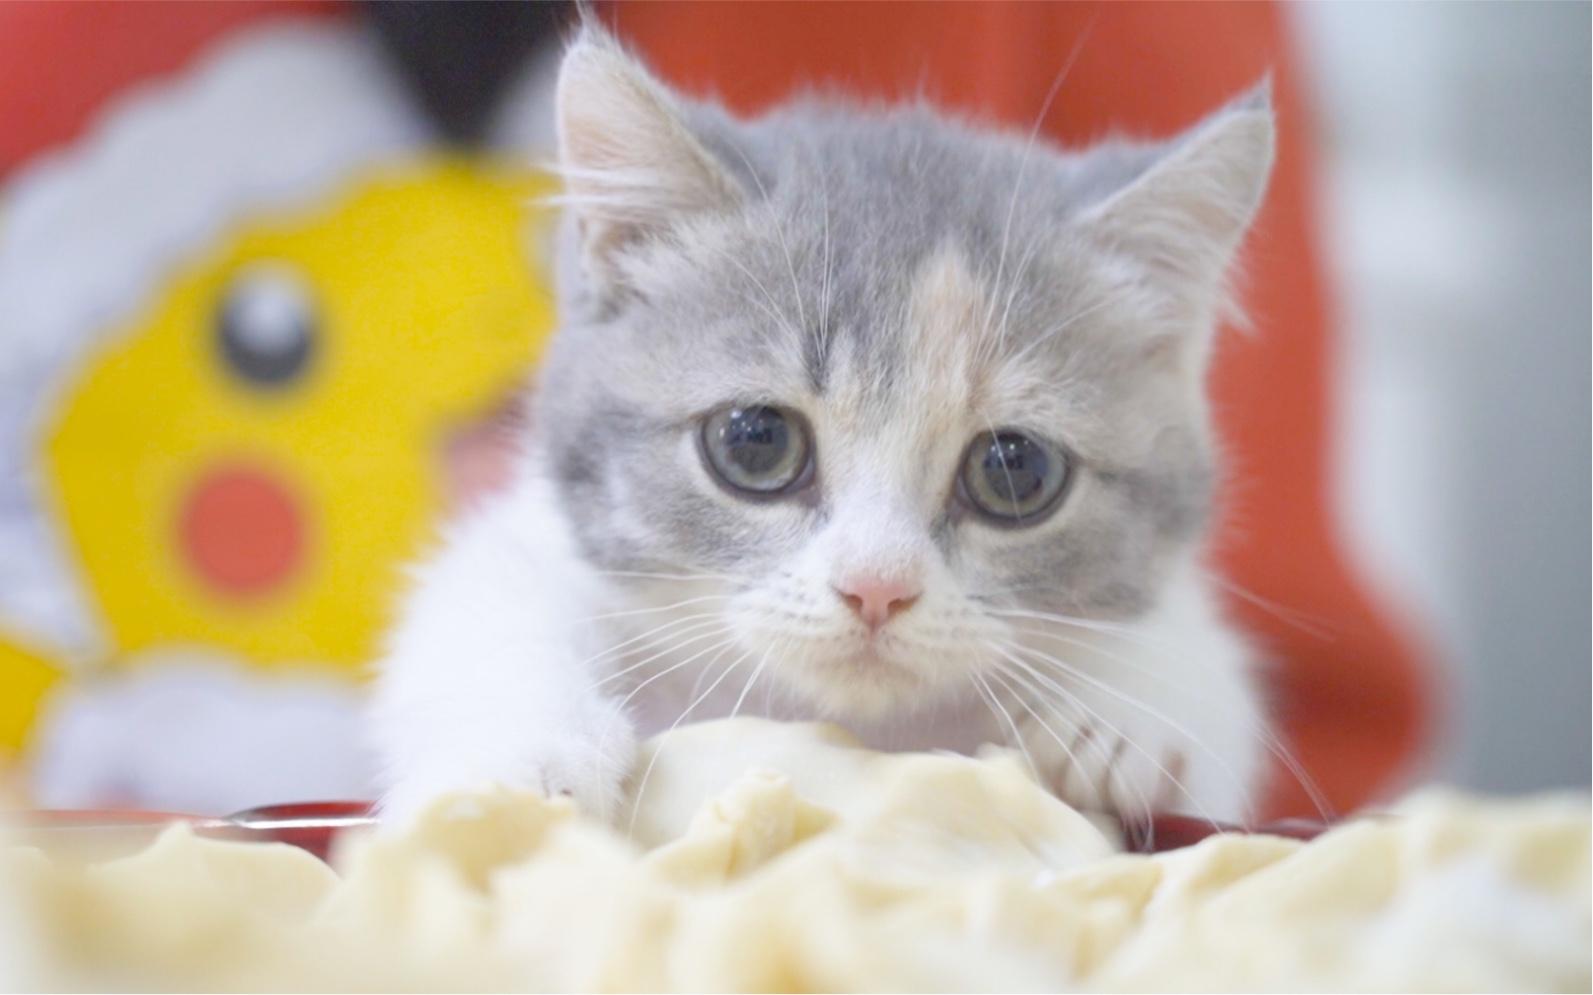 千萬別和小奶貓一起包餃子!你的餃子會越包越少……_嗶哩嗶哩 (゜-゜)つロ 干杯~-bilibili